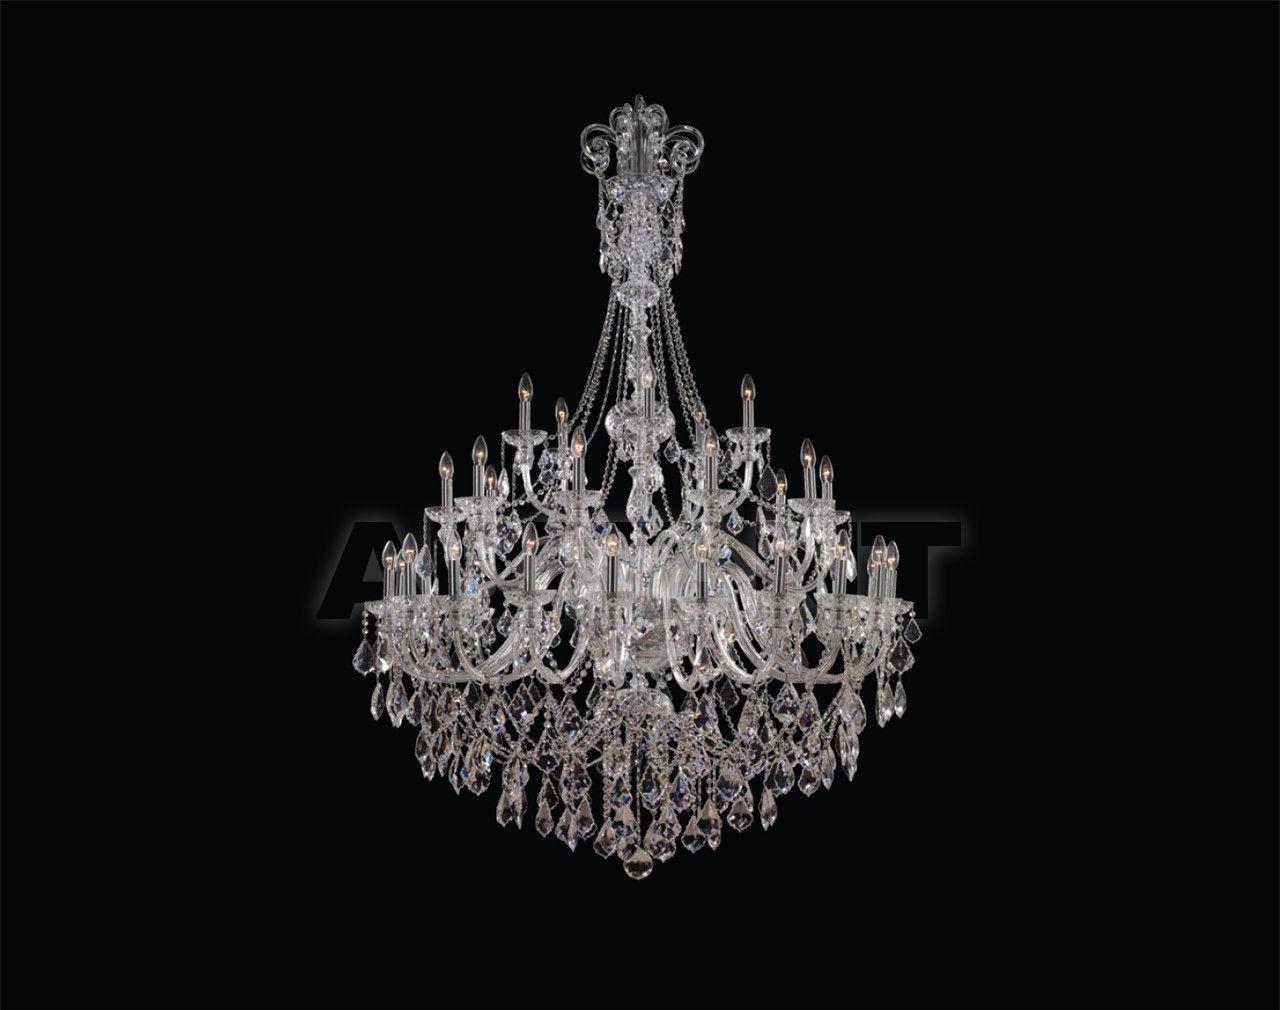 Купить Люстра EKATHERINA Iris Cristal Luxus 620108 35